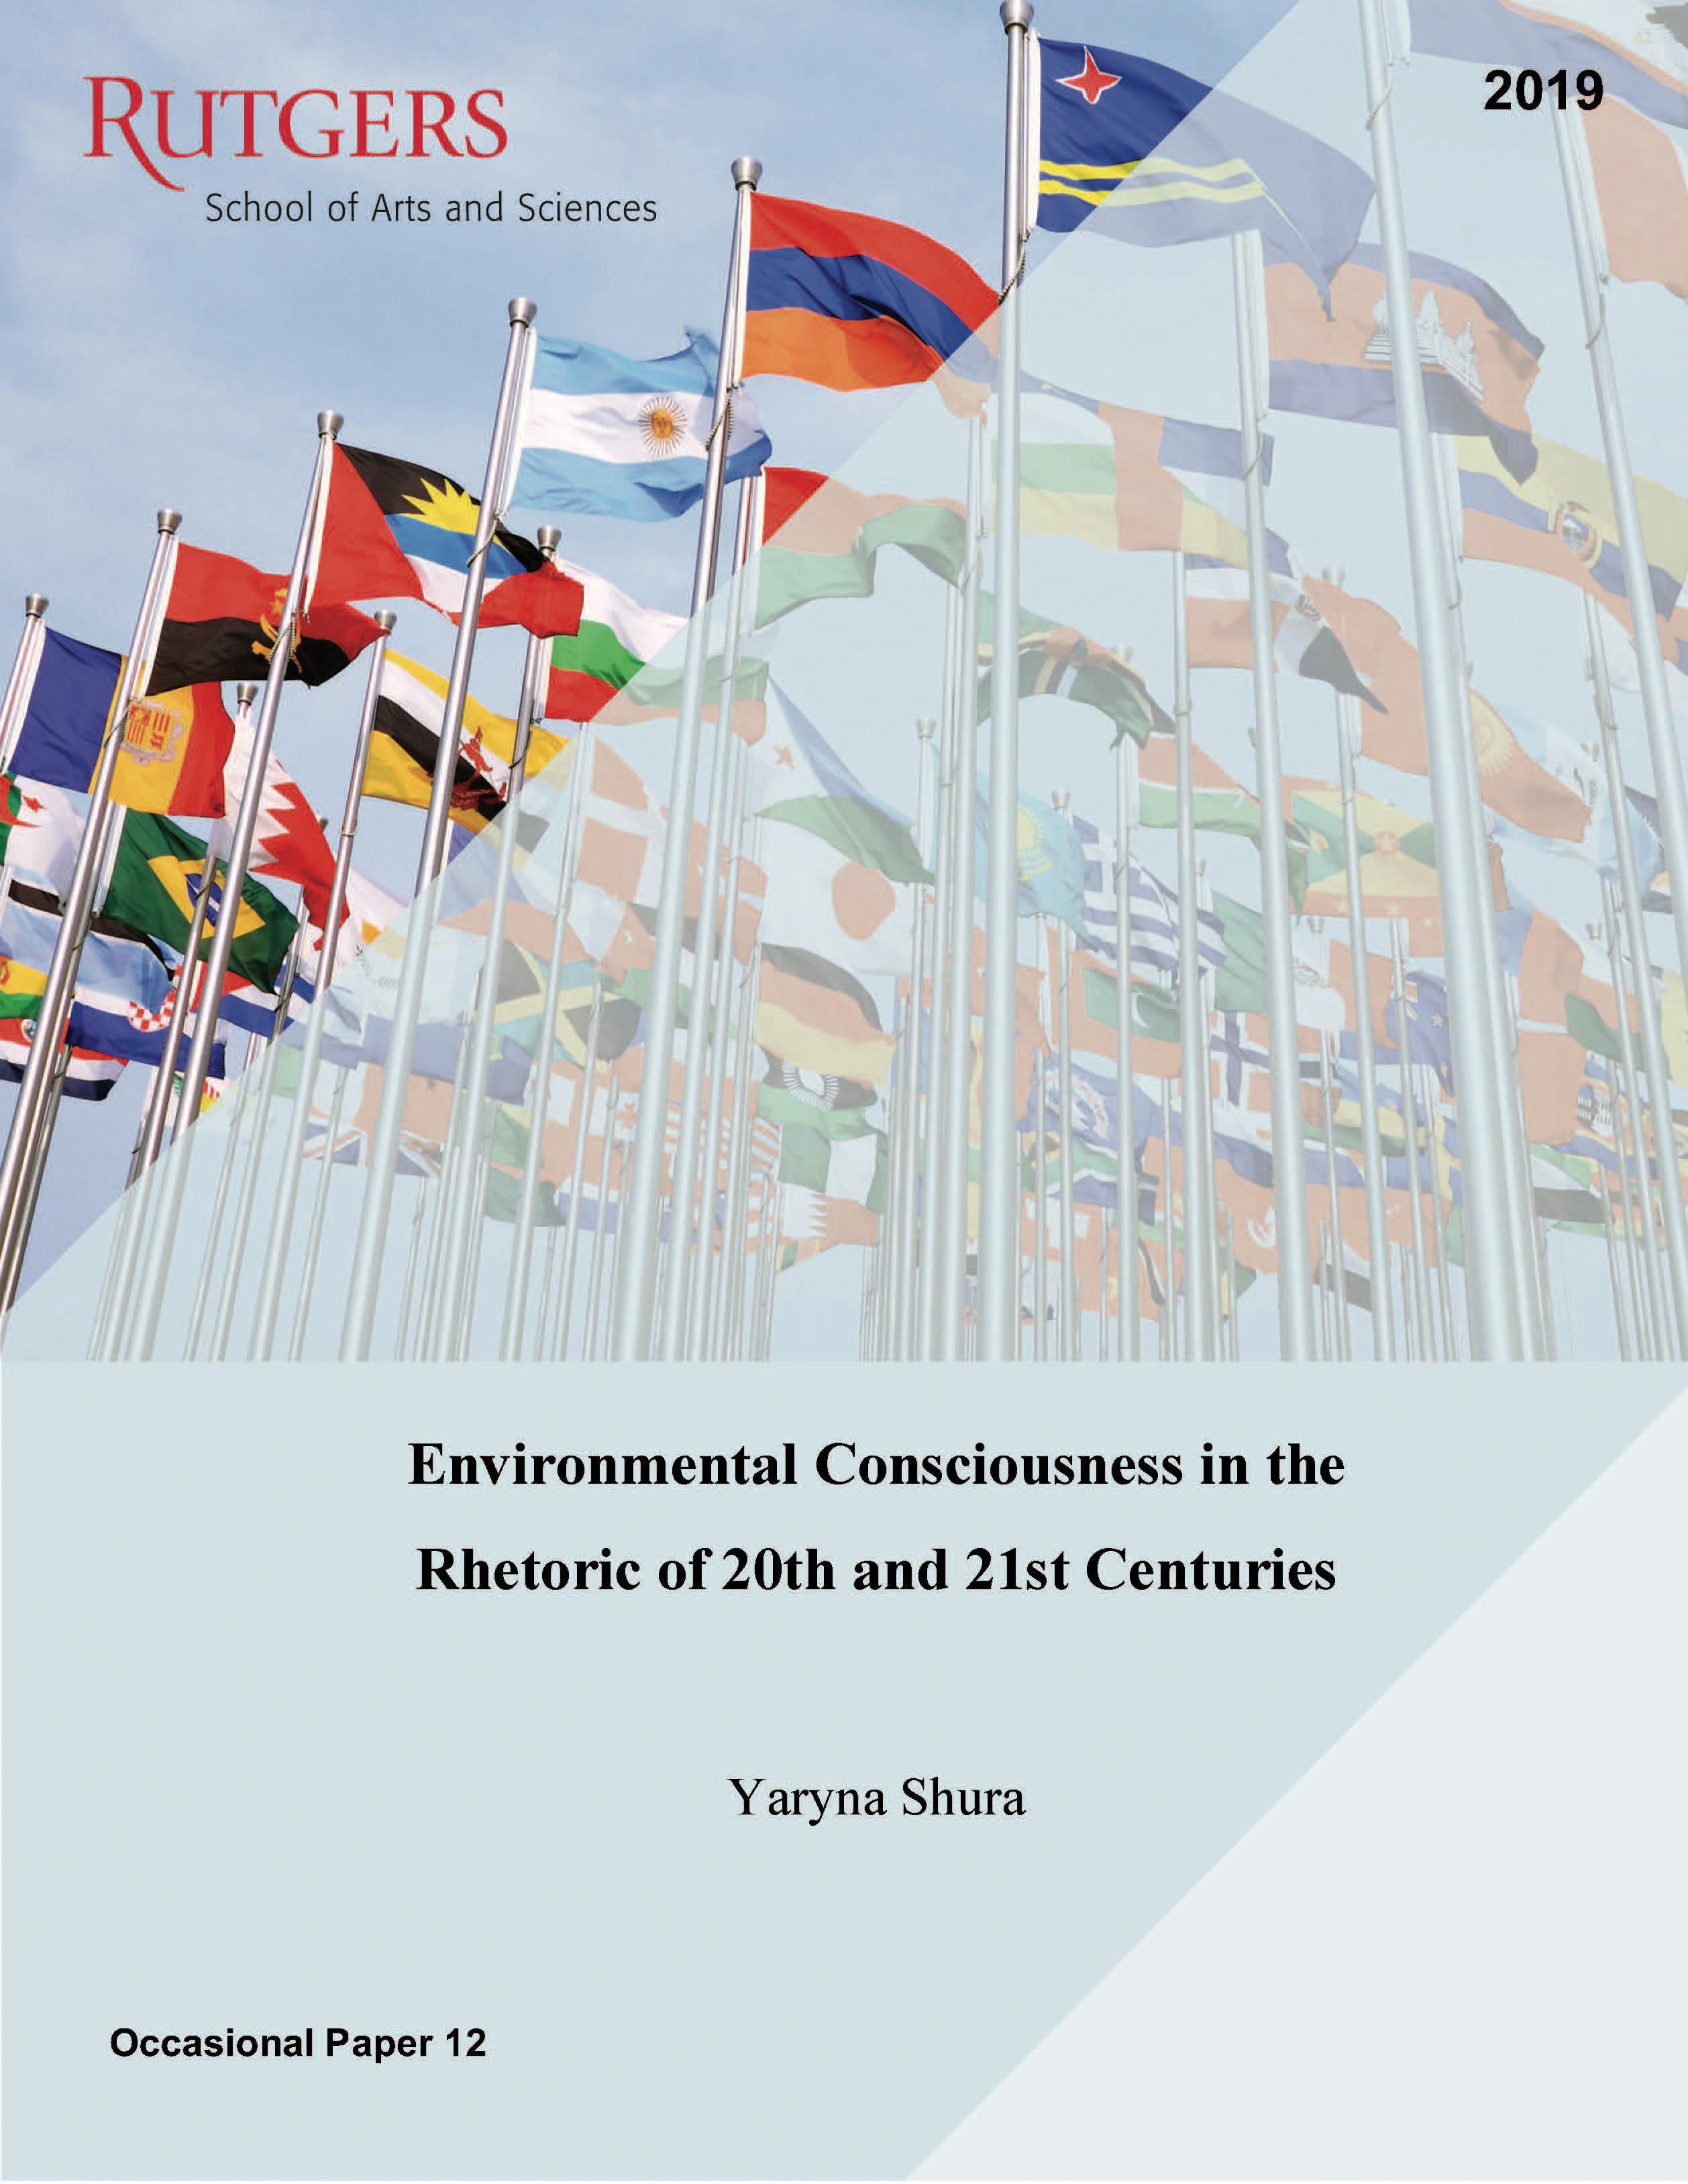 Occasional Paper 12 Yaryna Shura